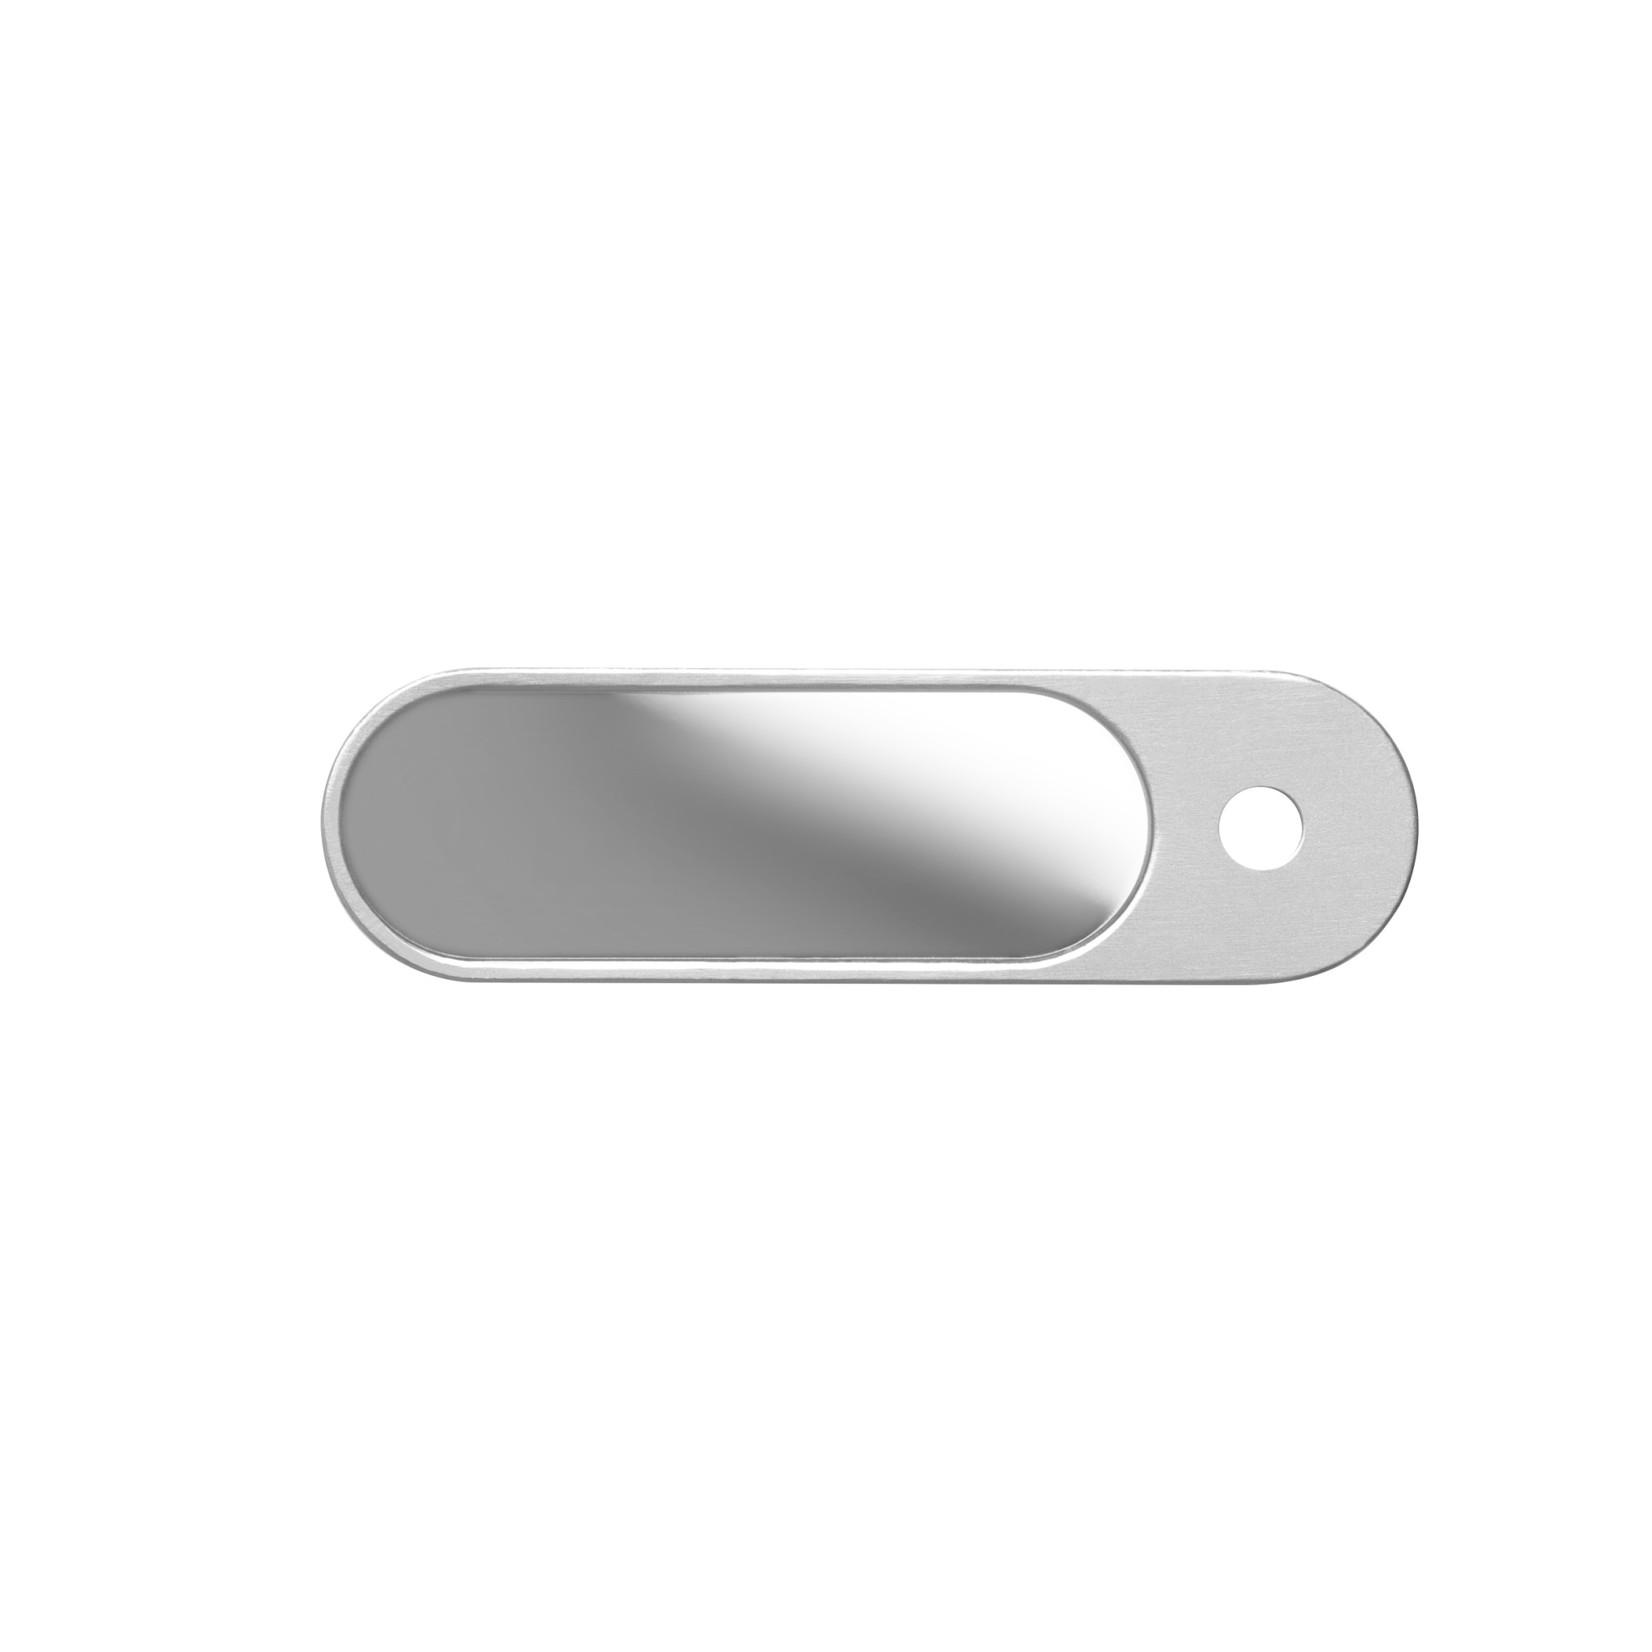 Orbitkey 2.0 accessoire nagelvijl en spiegel in één